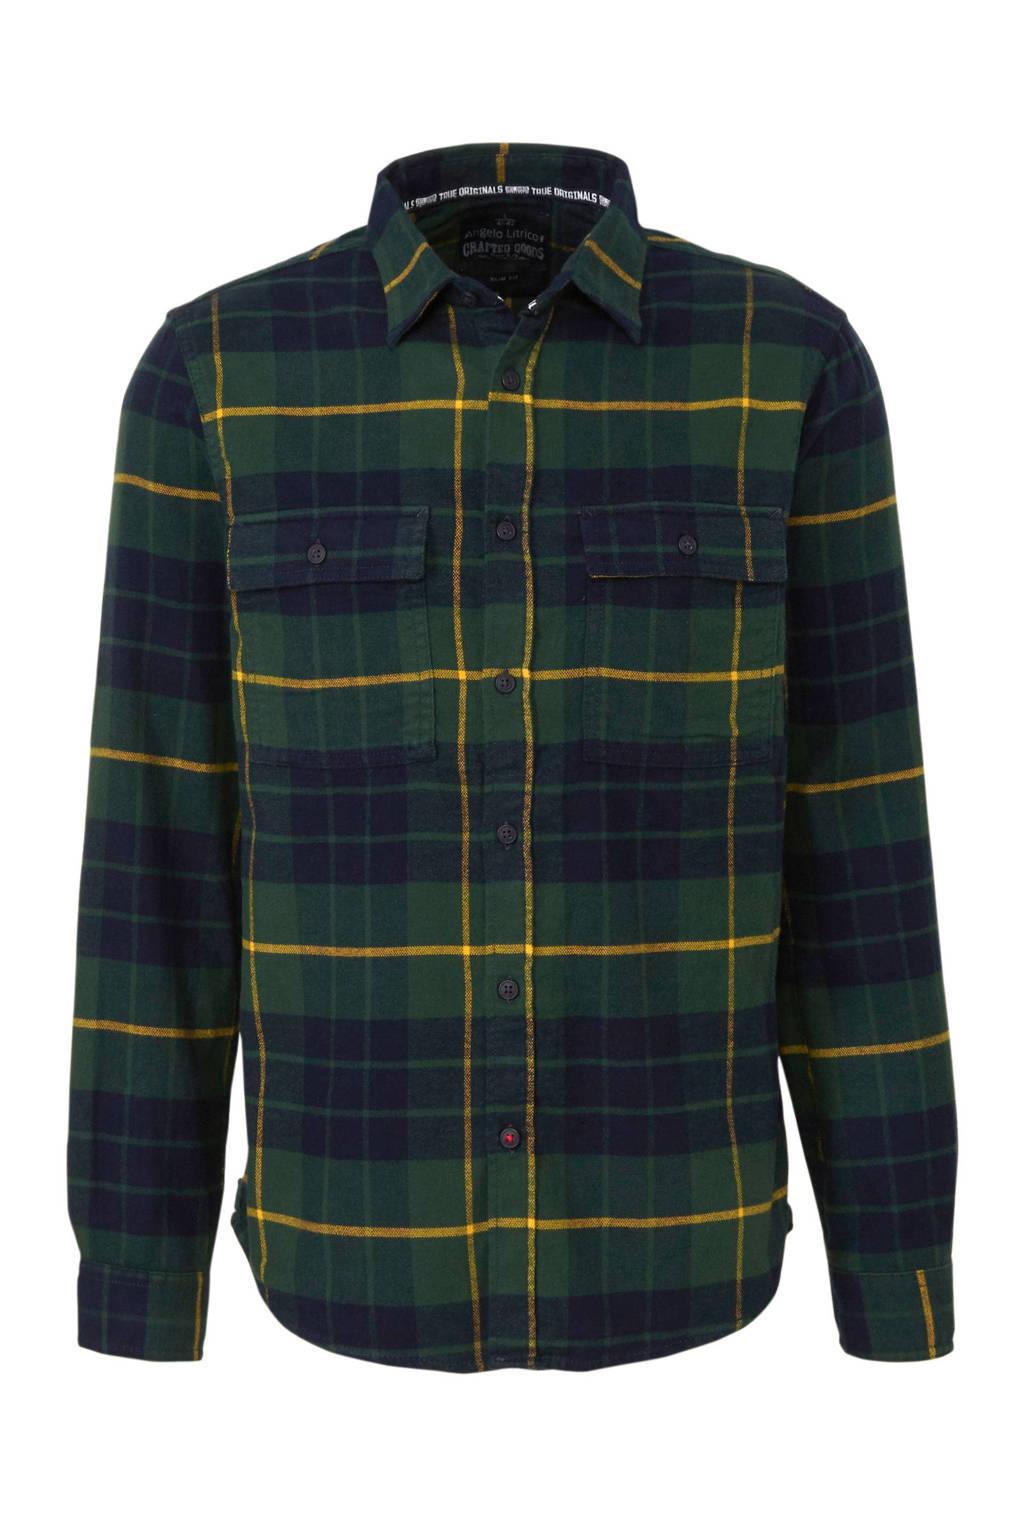 C&A Angelo Litrico geruit flanellen slim fit overhemd groen/marine, Groen/marine